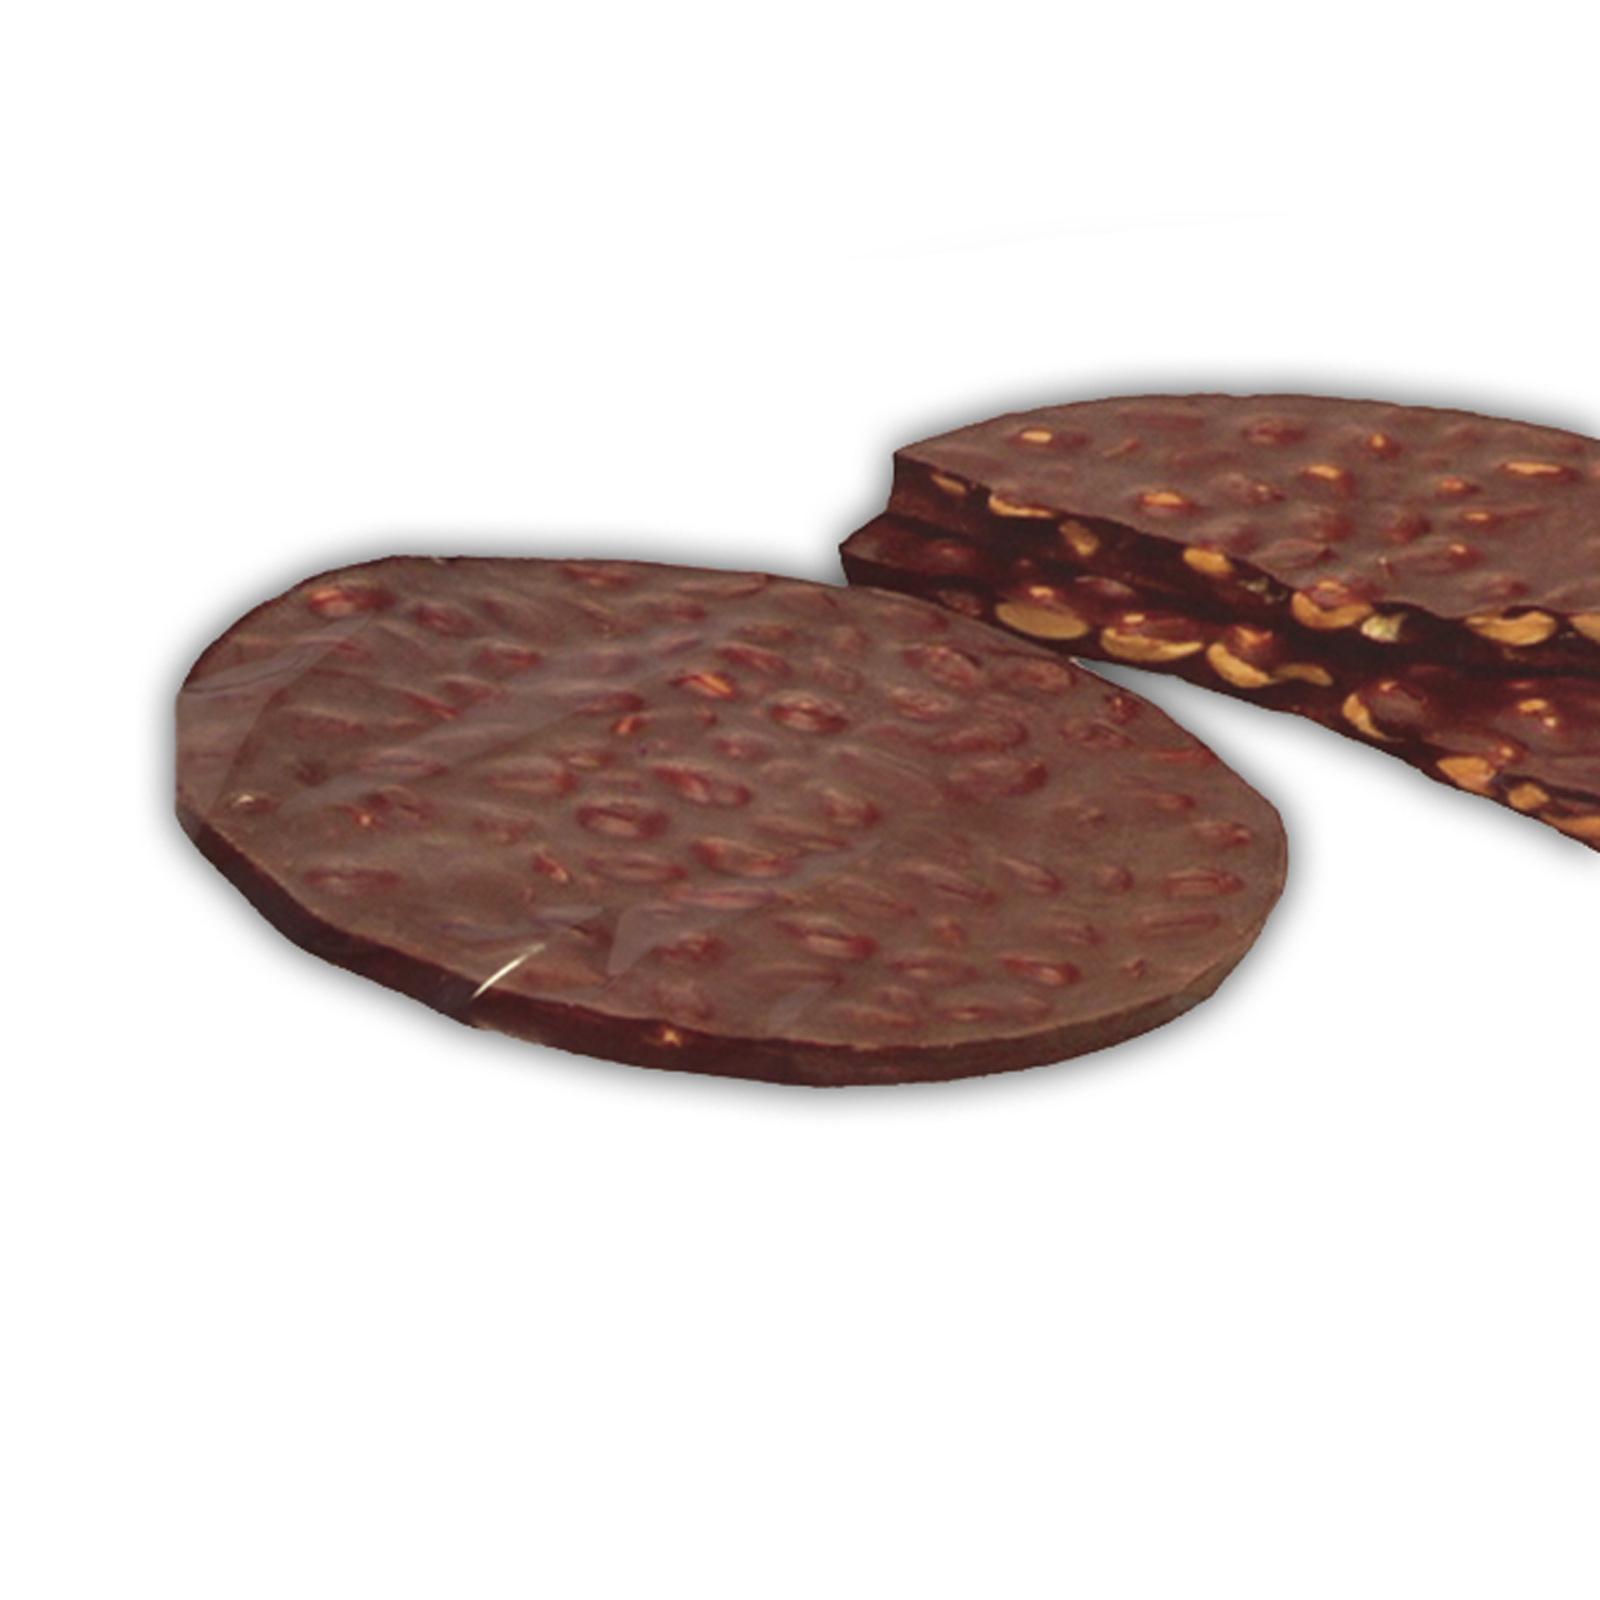 Garrido torta chocoalmendra